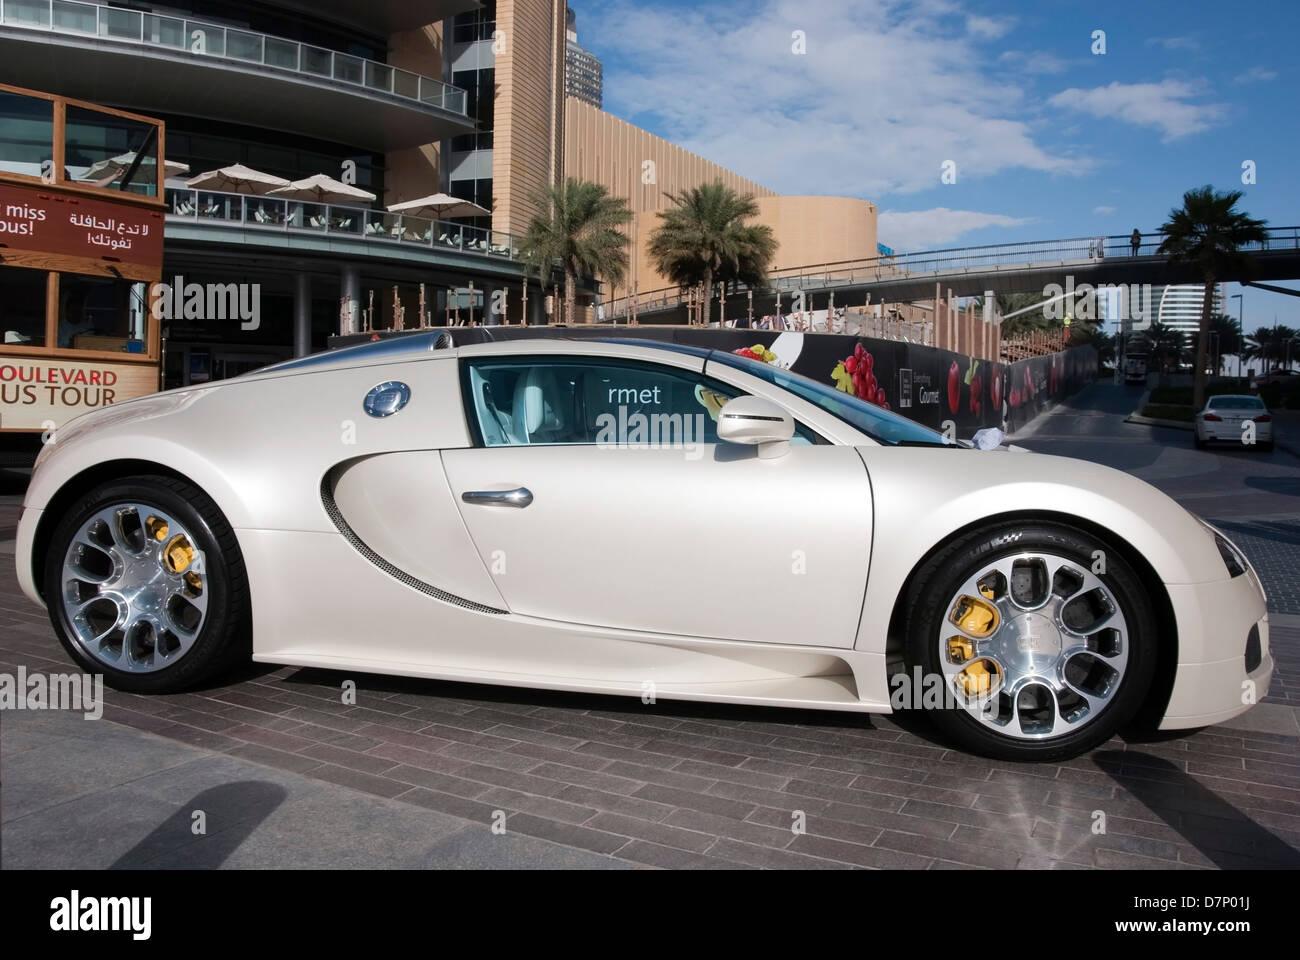 pearlescent white bugatti veyron eb sportscar stock photo royalty free image 56416686 alamy. Black Bedroom Furniture Sets. Home Design Ideas